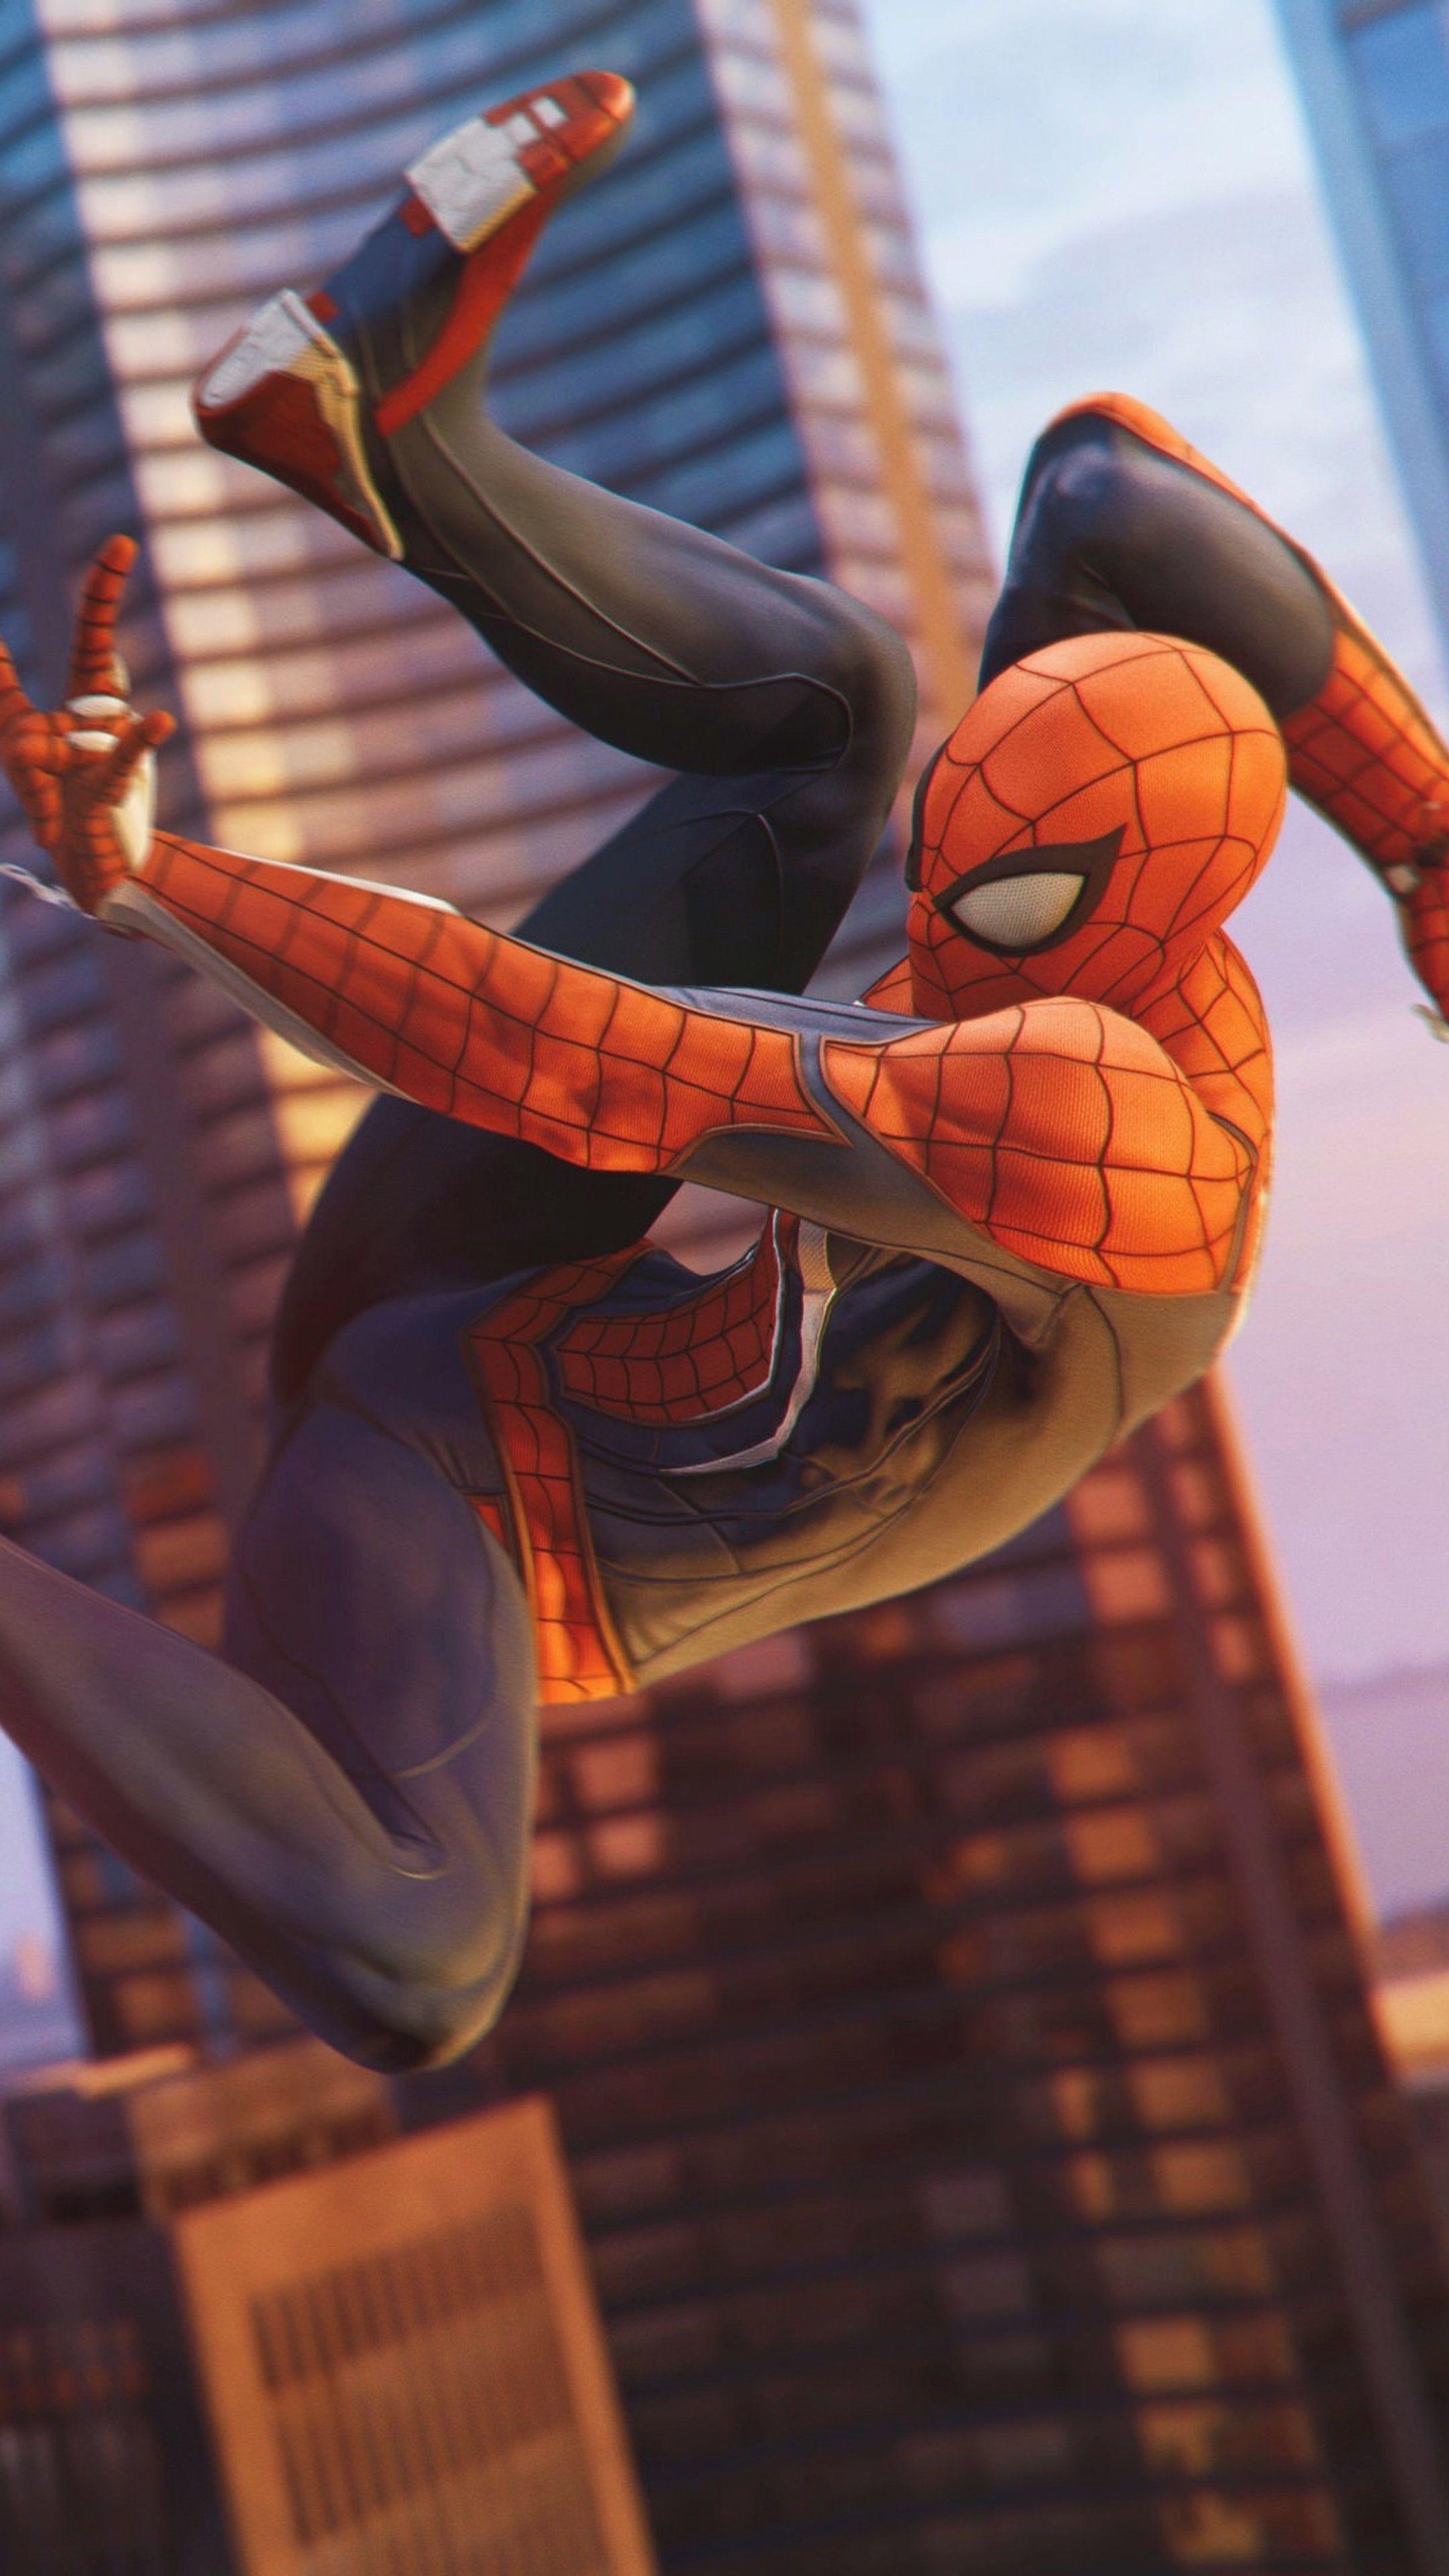 Lovely Spider Man Ps4 Wallpaper